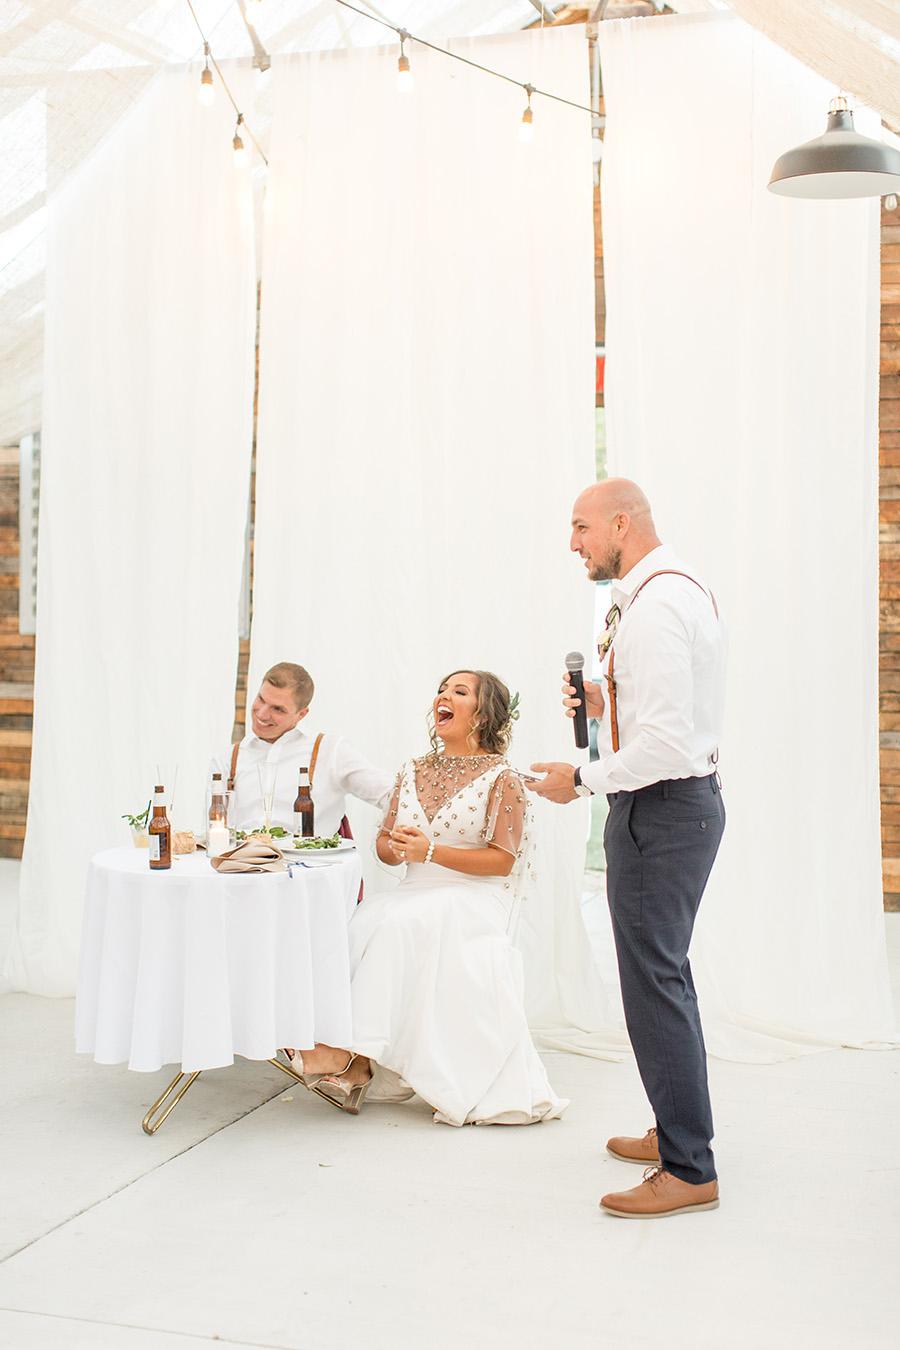 Best man gives a wedding toast